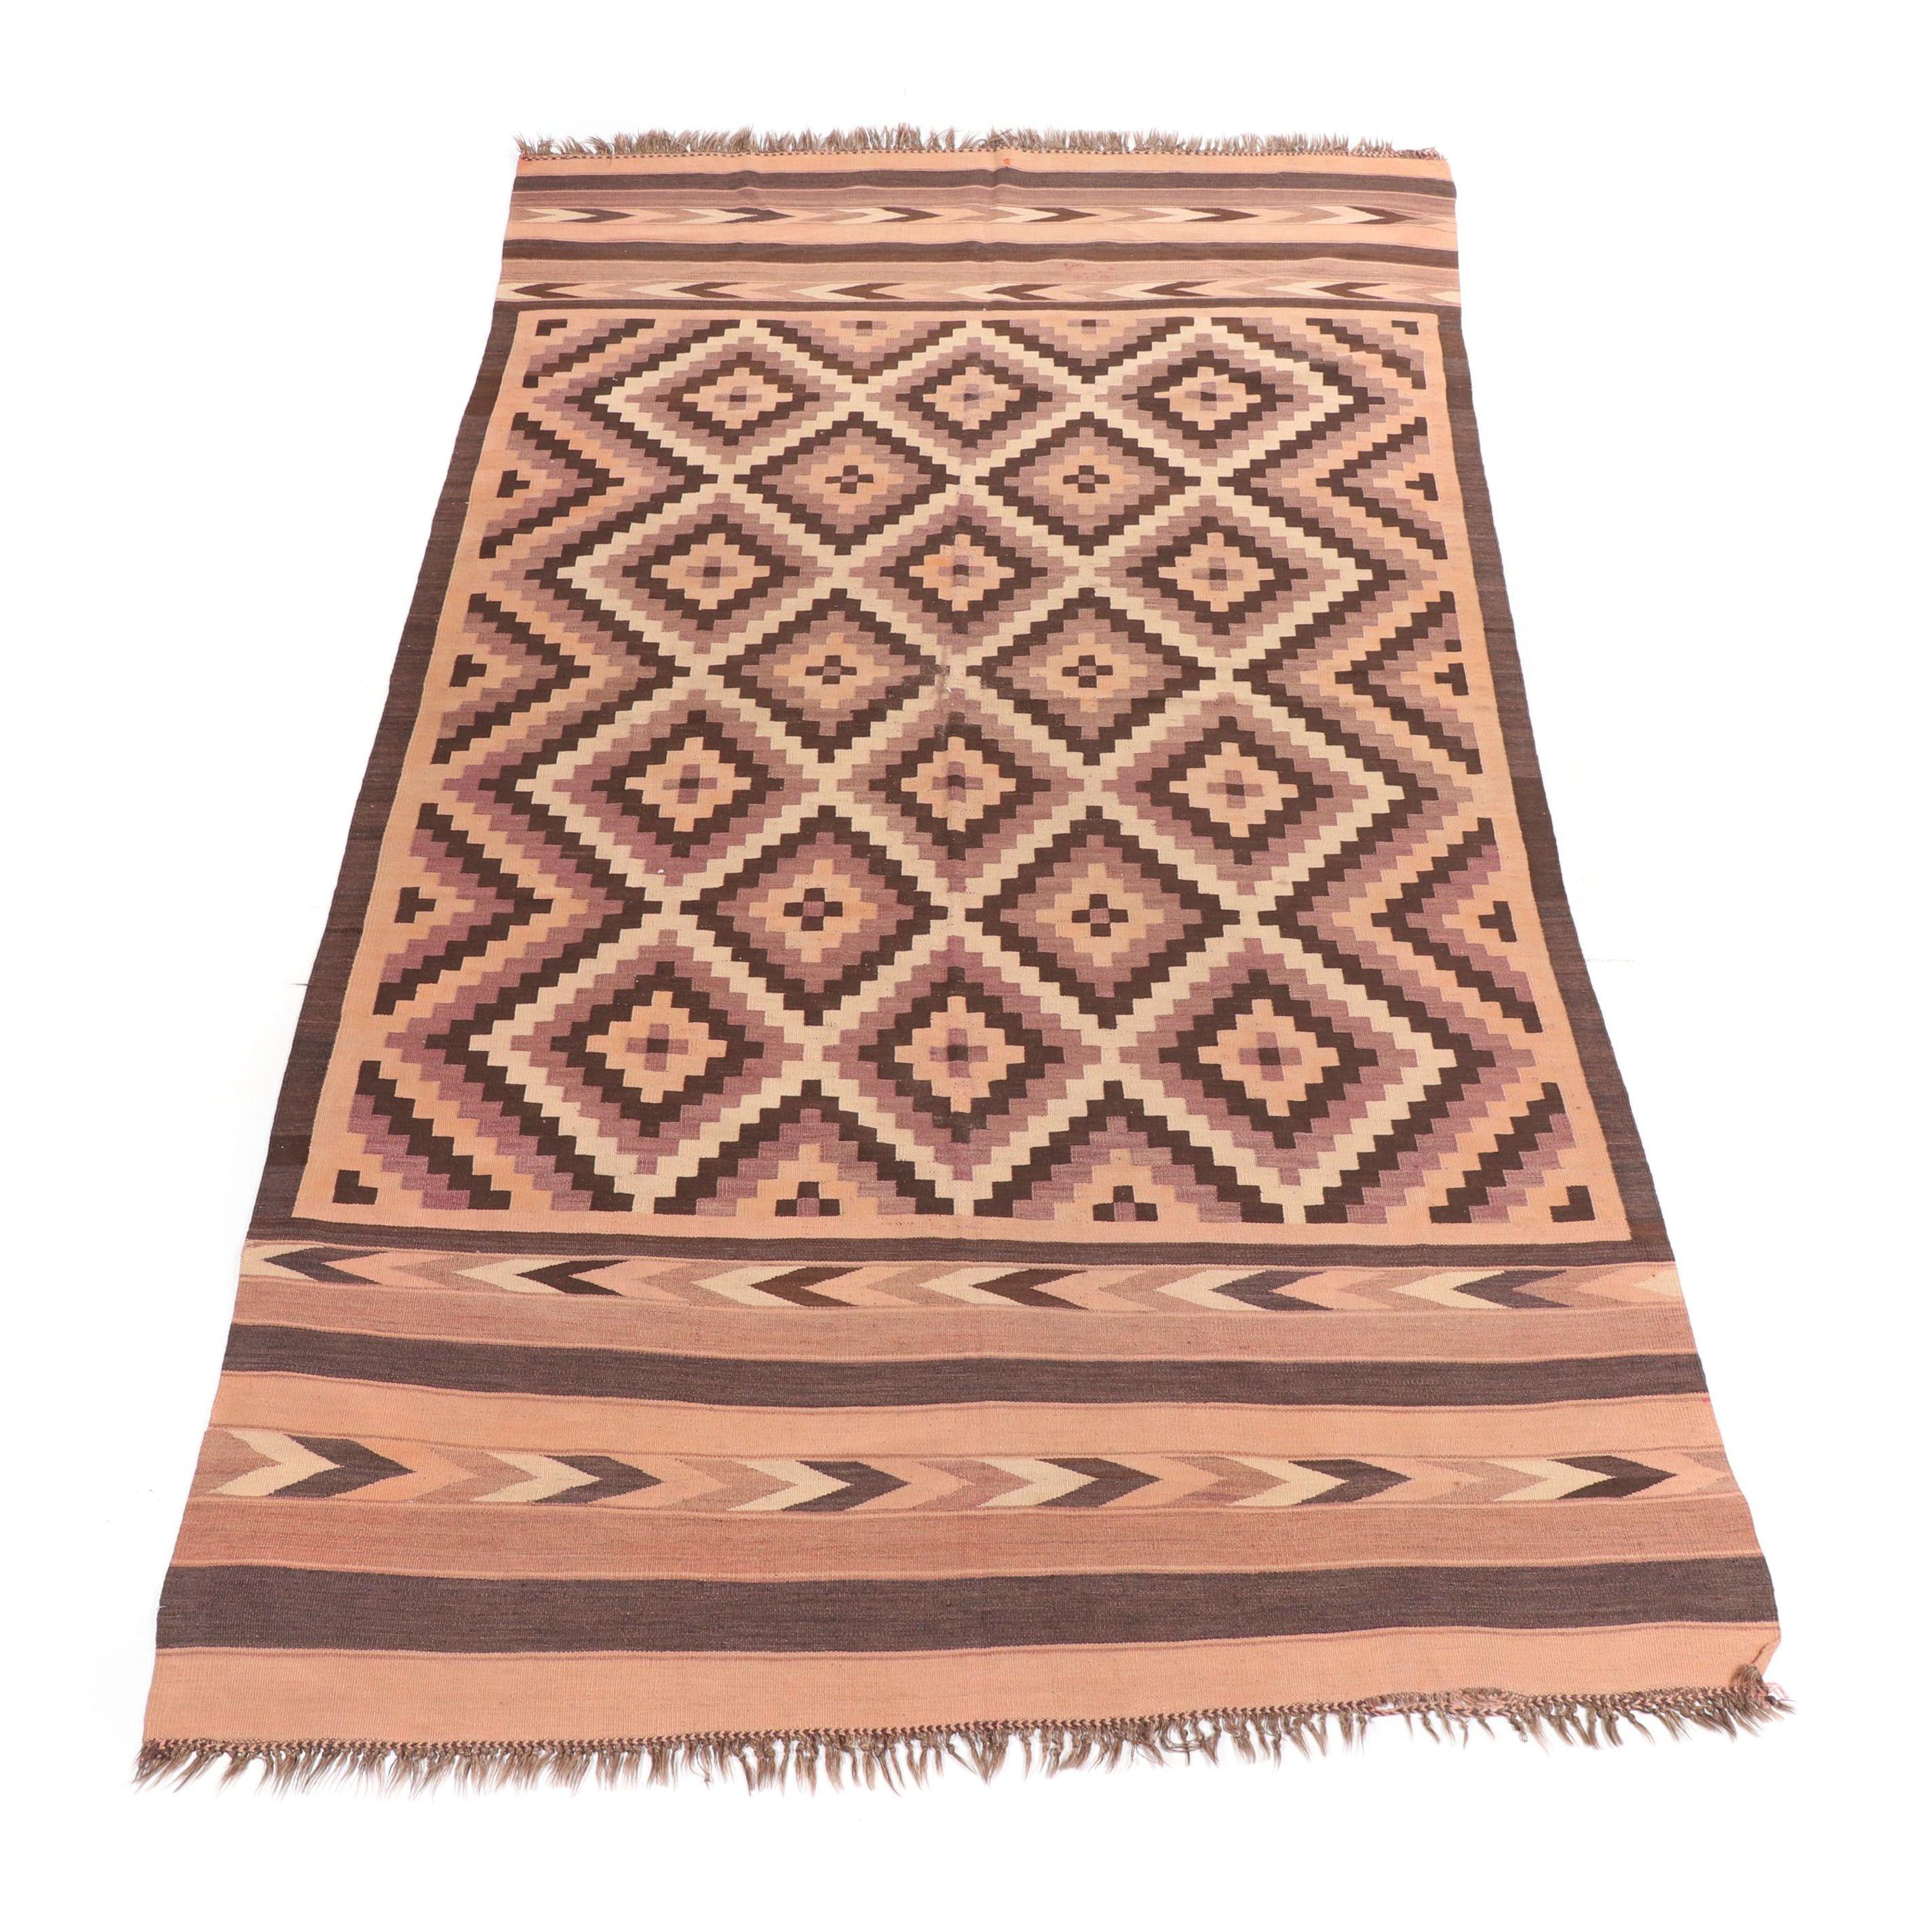 Handwoven Afghani Maimana Wool Kilim